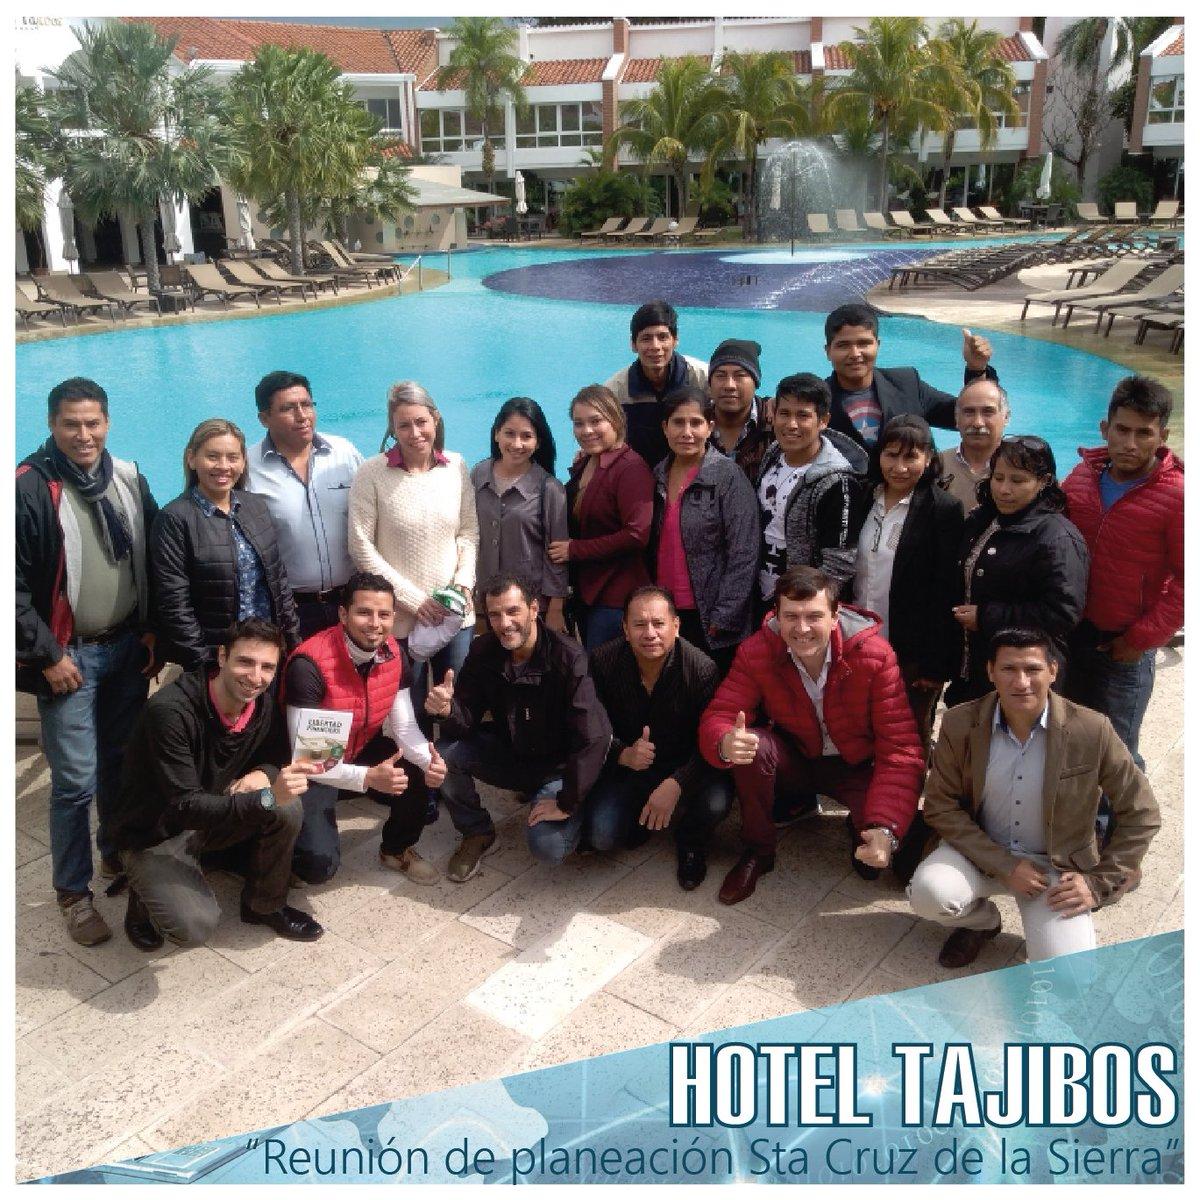 "Hotel Tajibos  ""Reunión de planeacion Santa Cruz de la Sierra"" https://t.co/KwATRt4NbK"